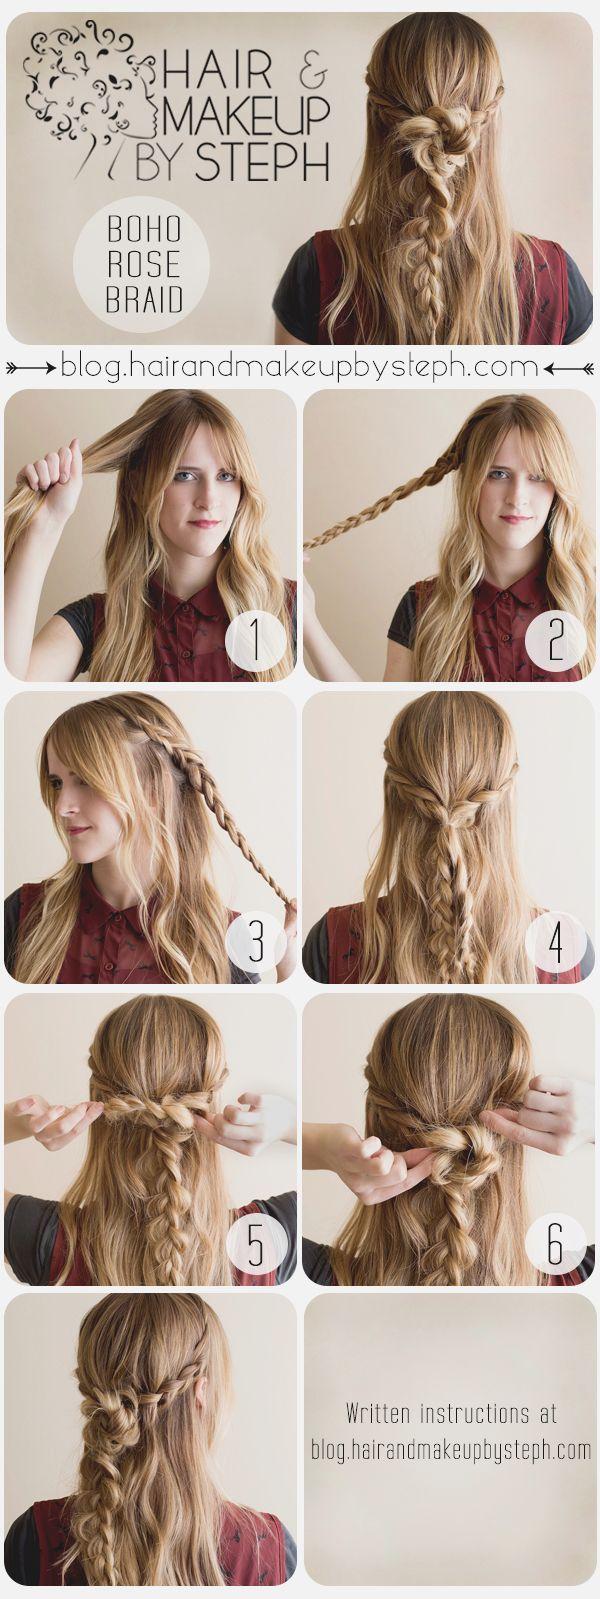 Classy Beach Hair You Haven't Tried Yet | Pretty Designs